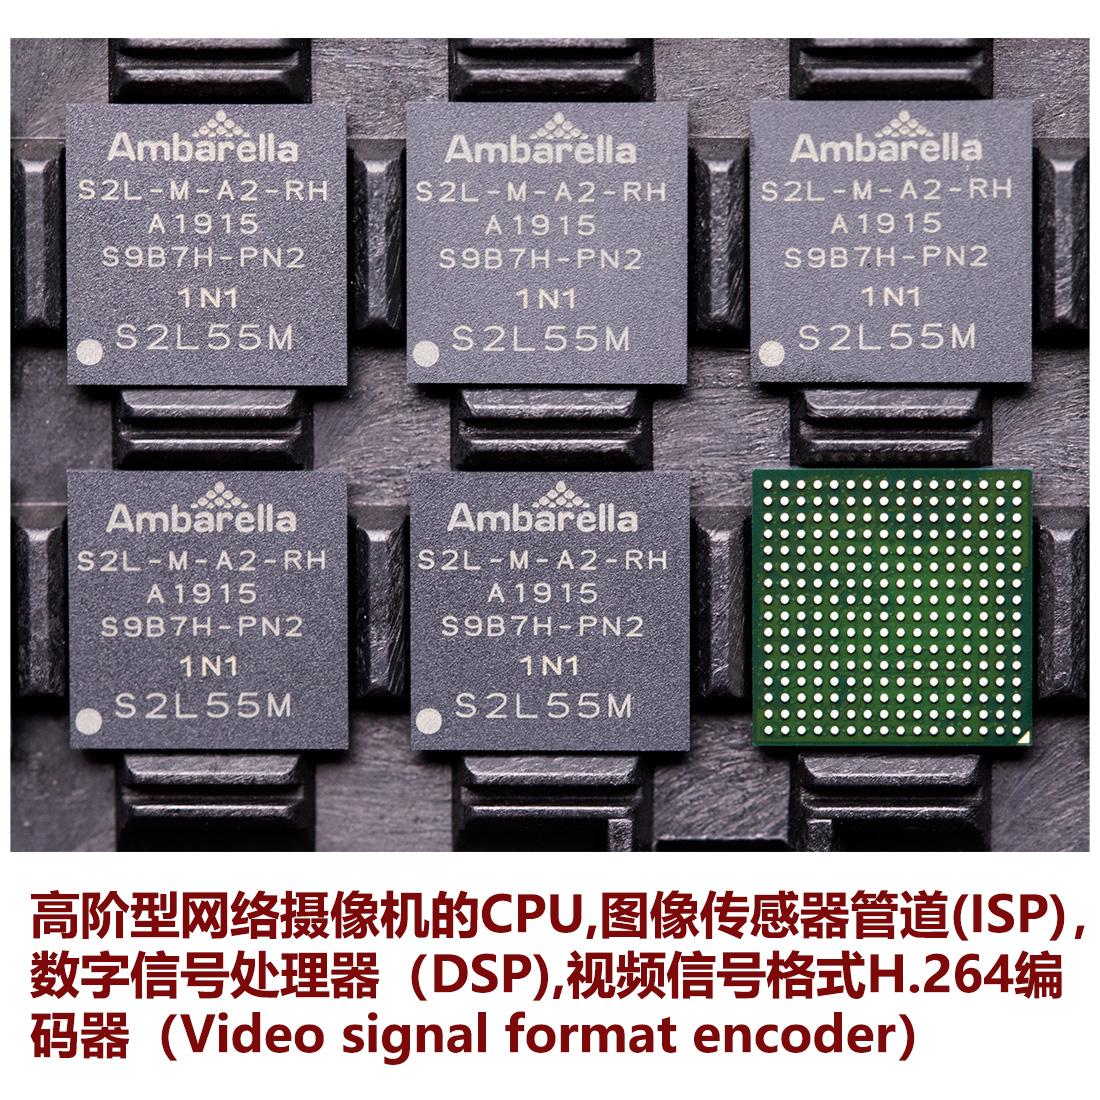 S2L55M 安霸Ambarella 集成系统芯片平台SoC,进阶型网络监控摄像机IP CAMERA 600Mhz ARM Cortex-A9 CPU 高性能数字信号处理(DSP)子系统、图像传感器管道(ISP) 高清H.264编解码引擎 codec engine